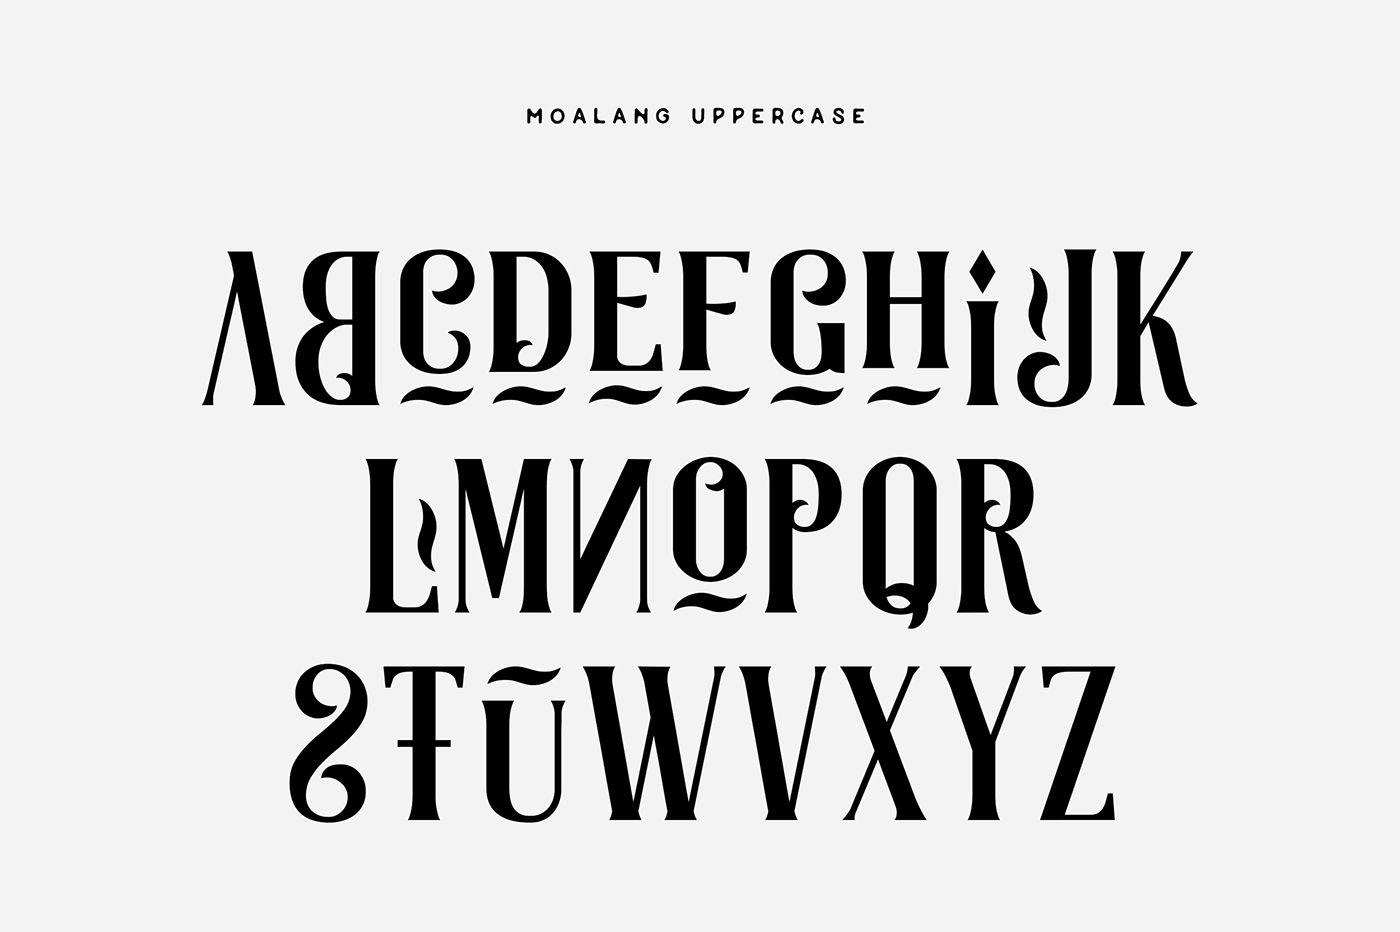 Moalang Free Font on Behance